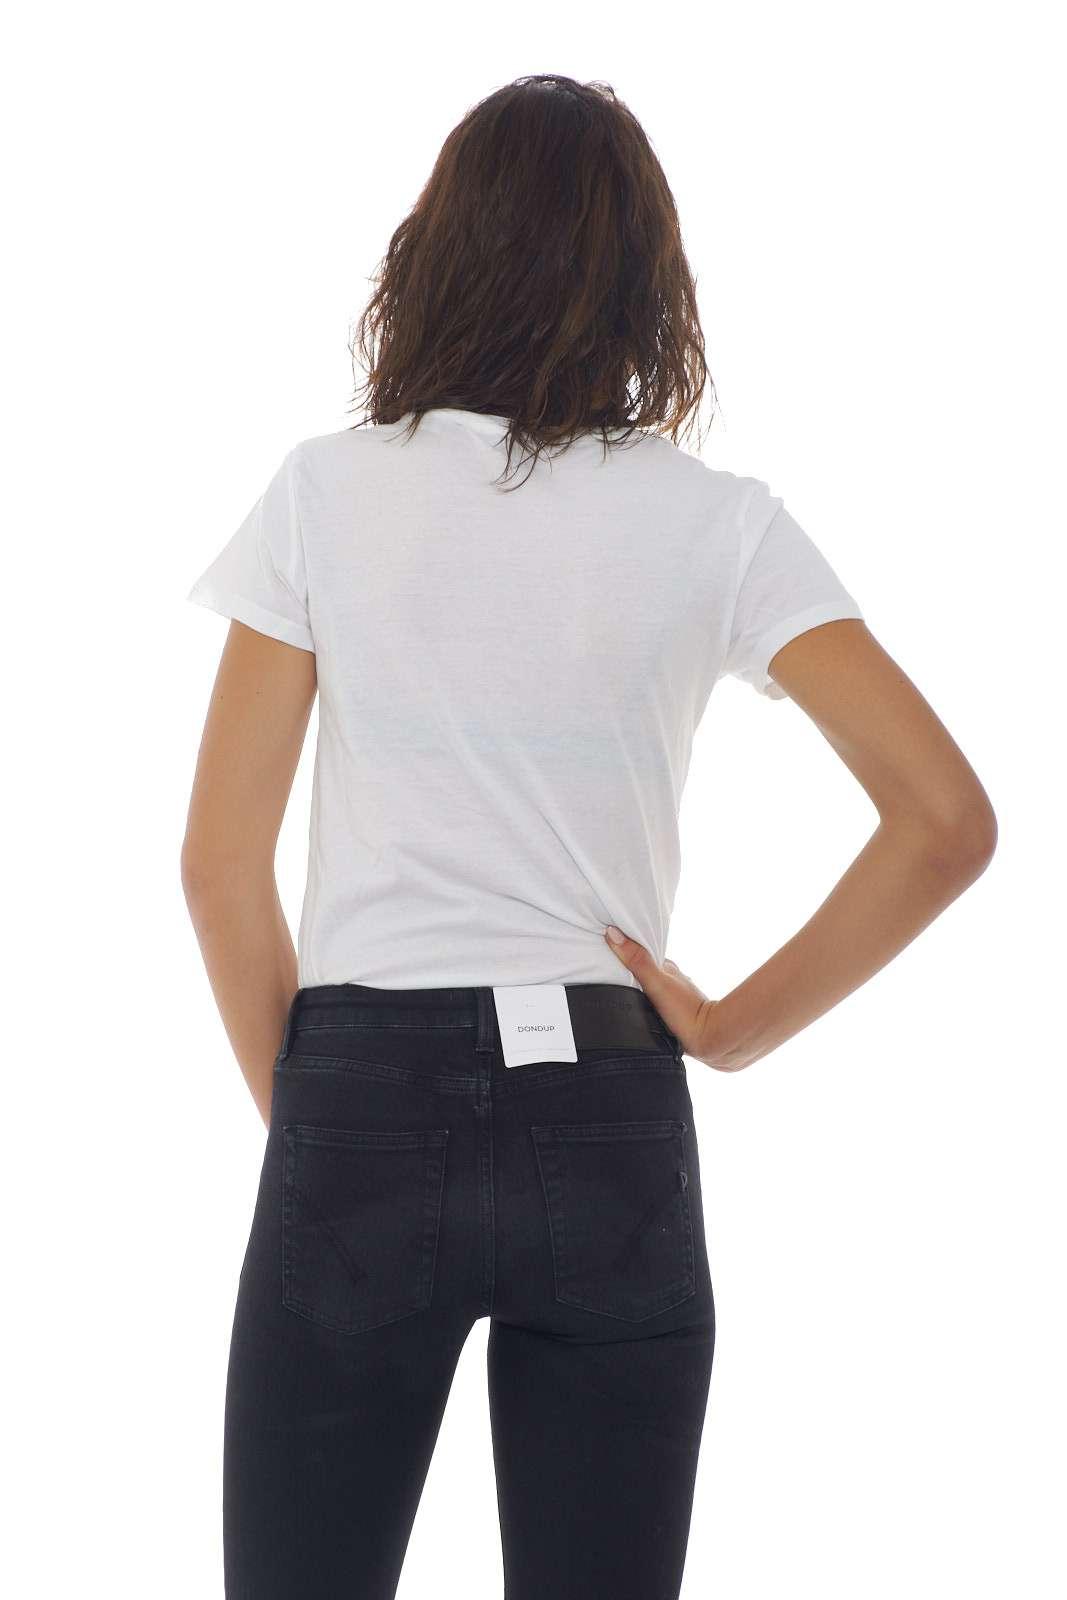 https://www.parmax.com/media/catalog/product/a/i/AI-outlet_parmax-t-shirt-donna-Levis-17369%200297-C.jpg